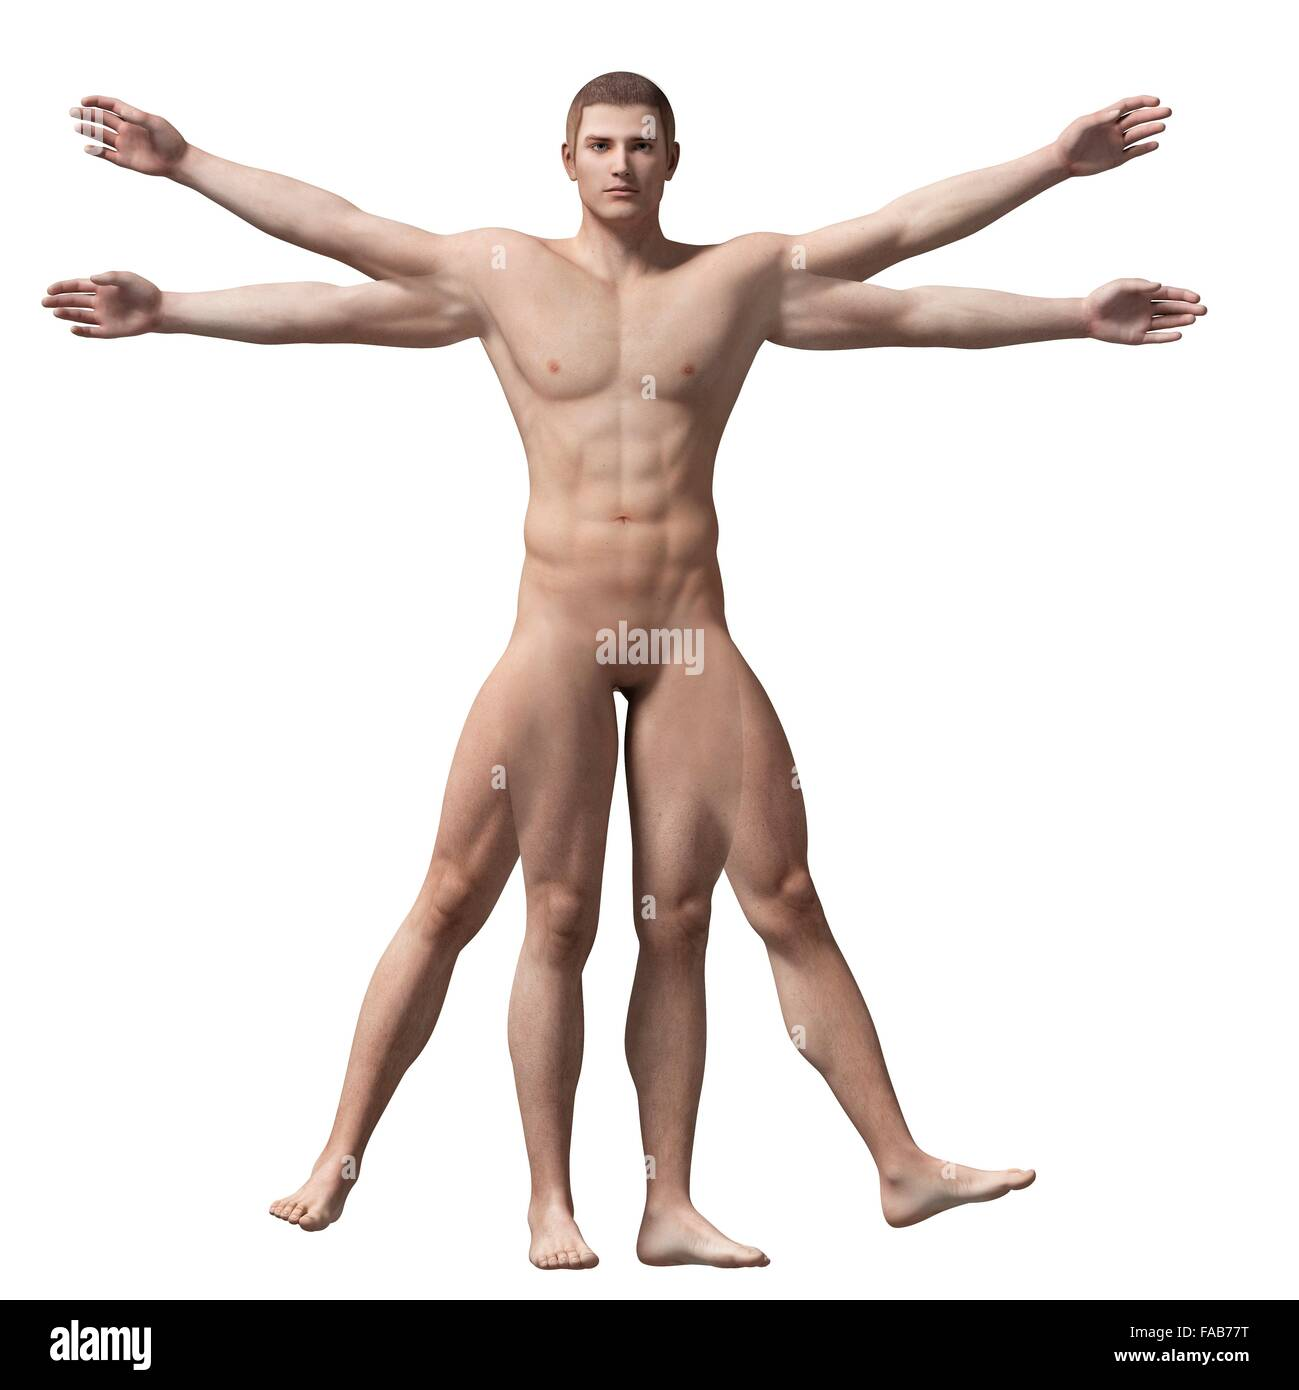 Vitruvian Man Anatomy Stock Photos & Vitruvian Man Anatomy Stock ...